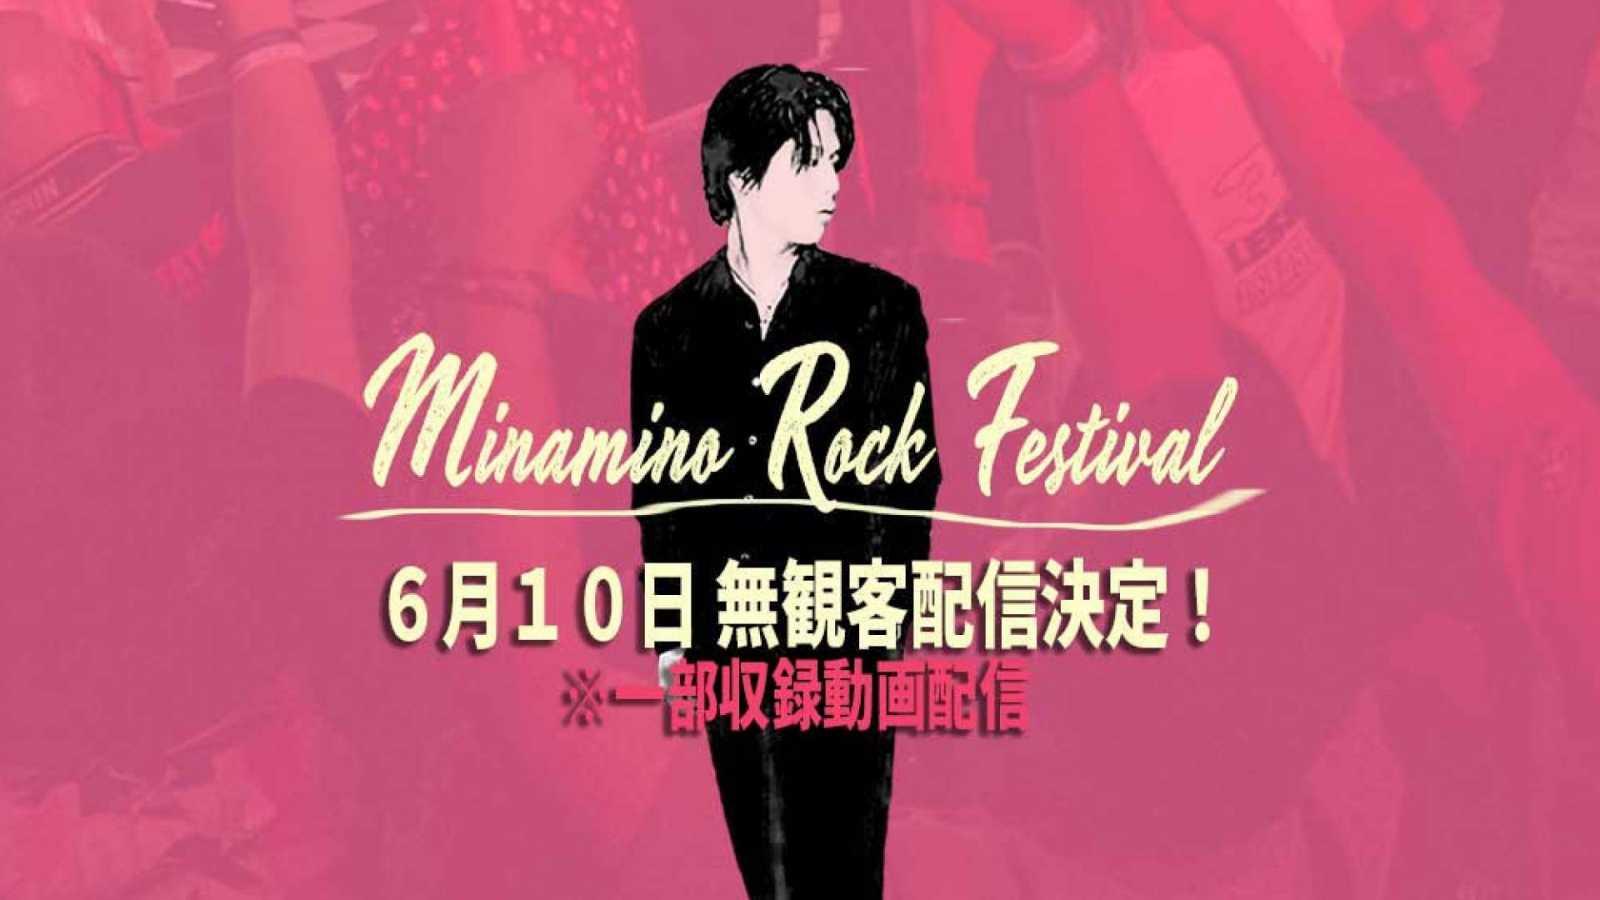 Minamino Rock Festival 2020 to Stream Worldwide © Minamino Rock Festival. All rights reserved.